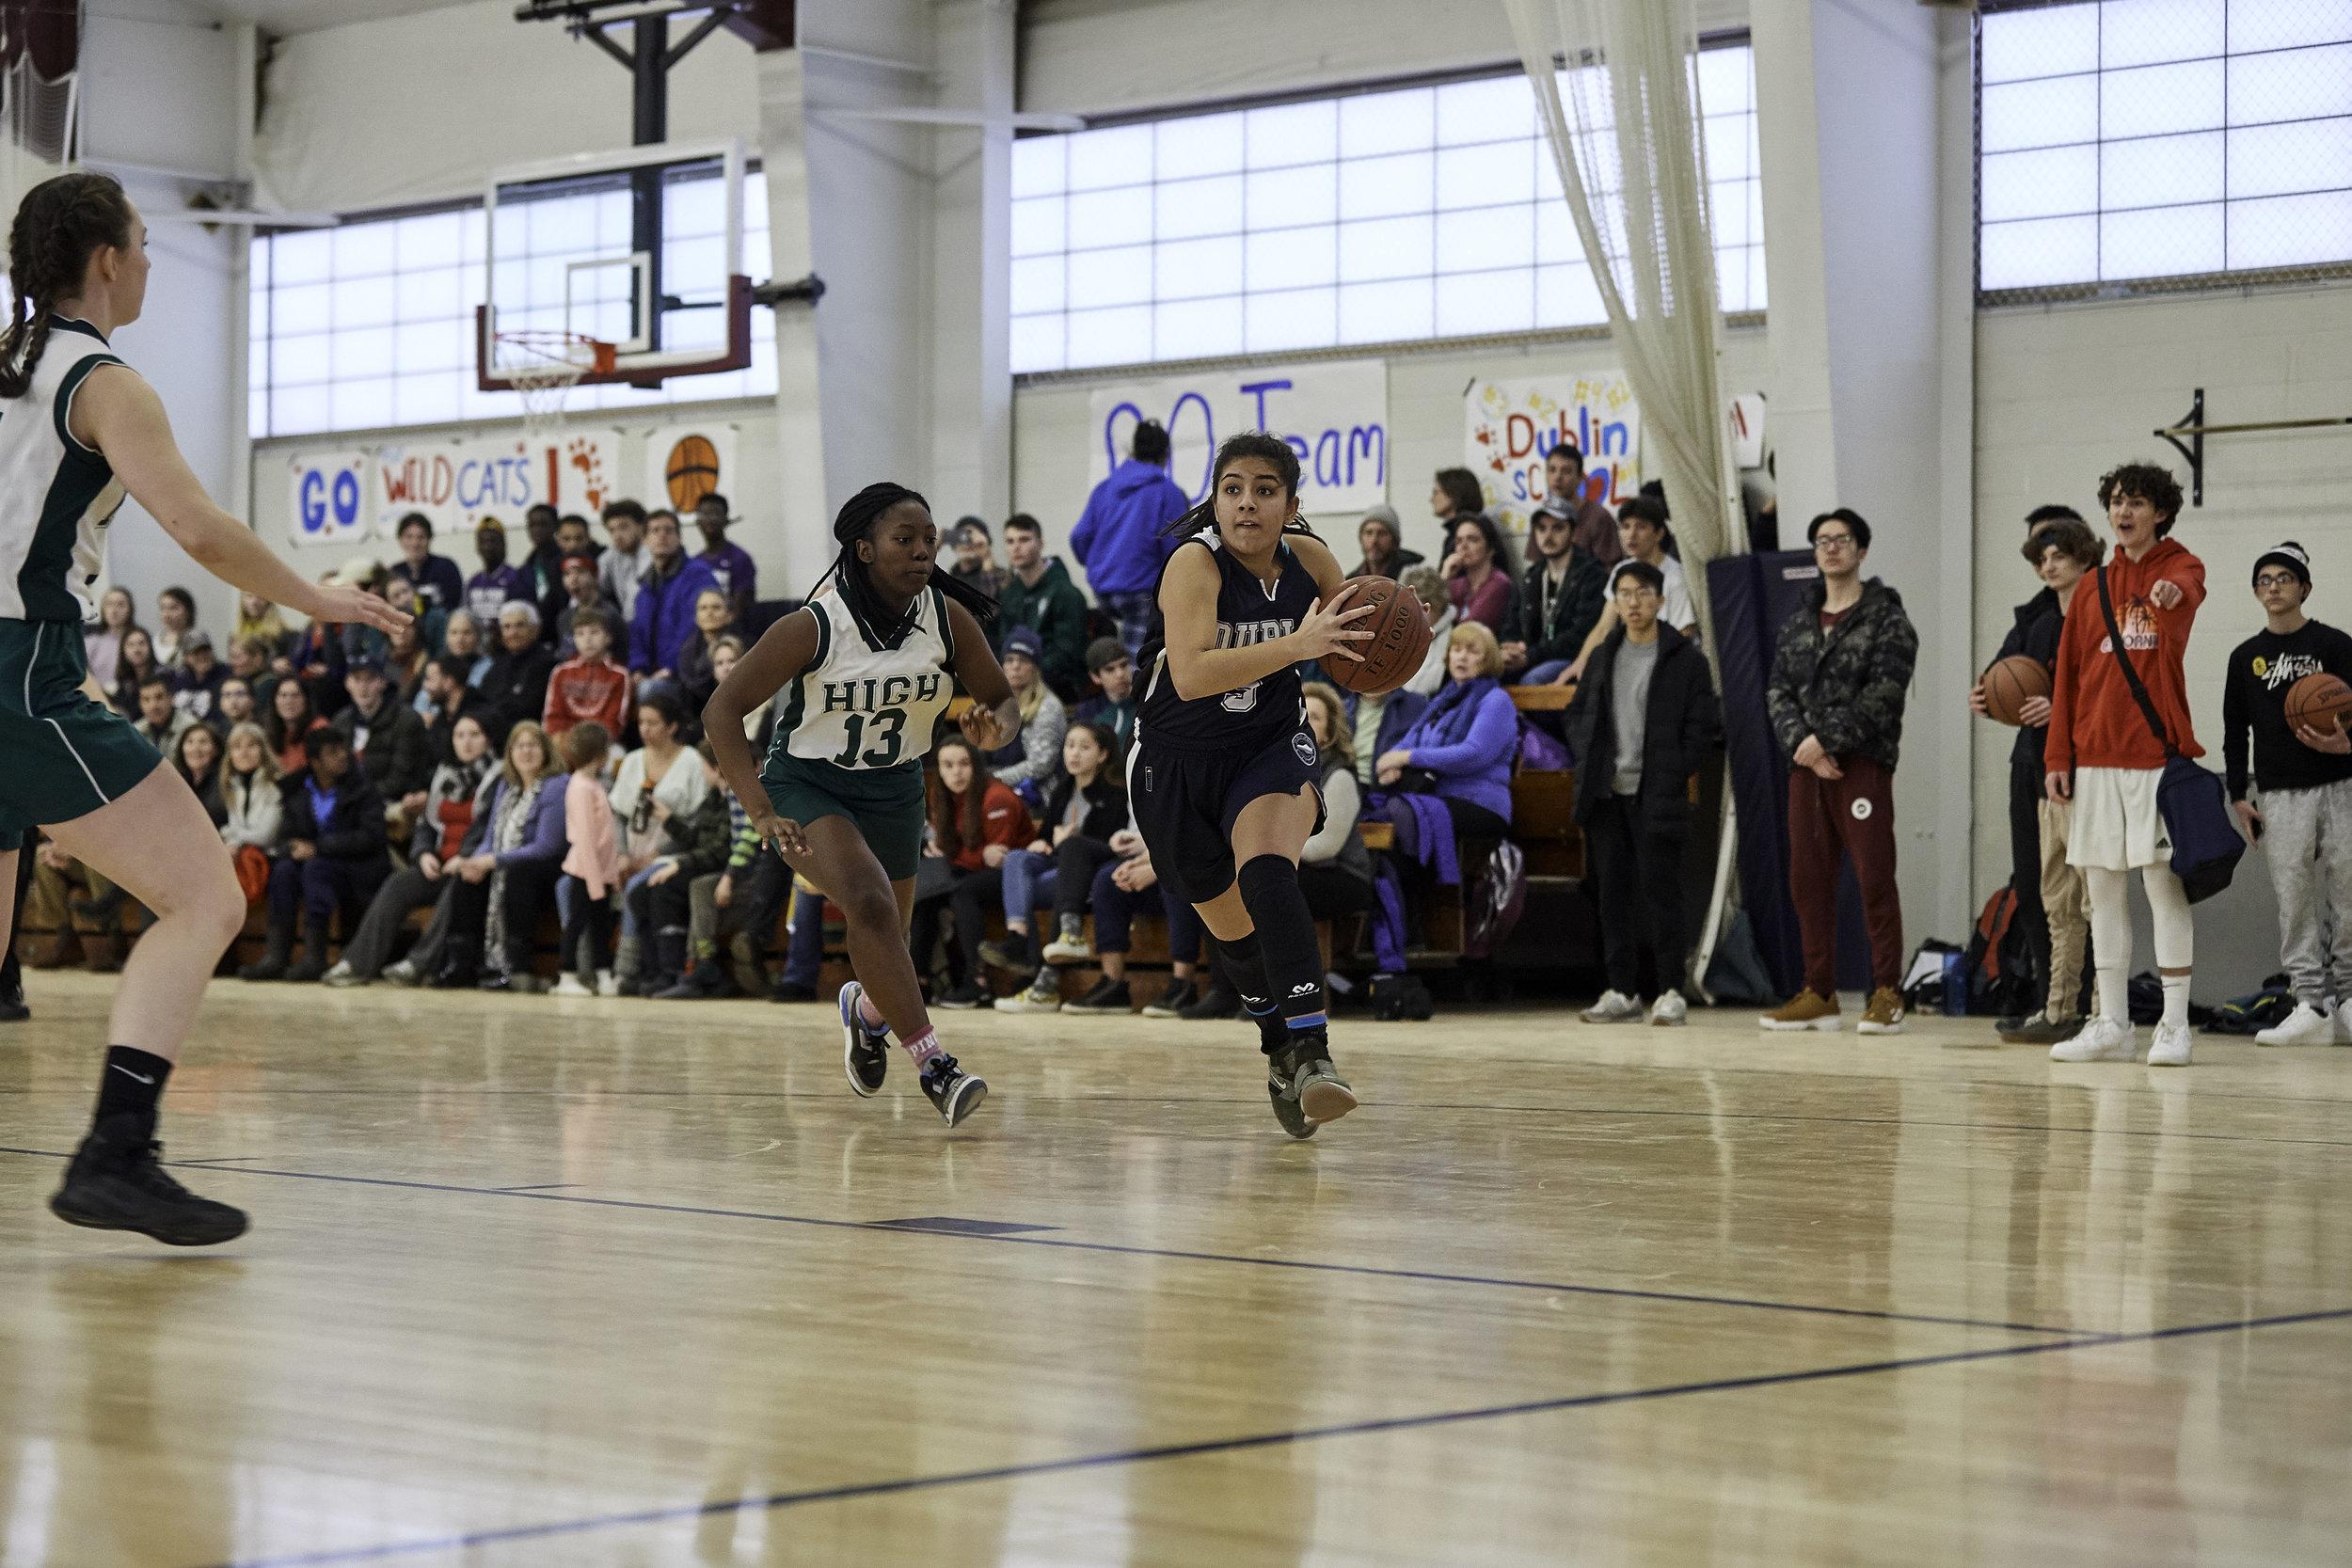 Basketball vs High Mowing School, February 2, 2019 - 166275.jpg